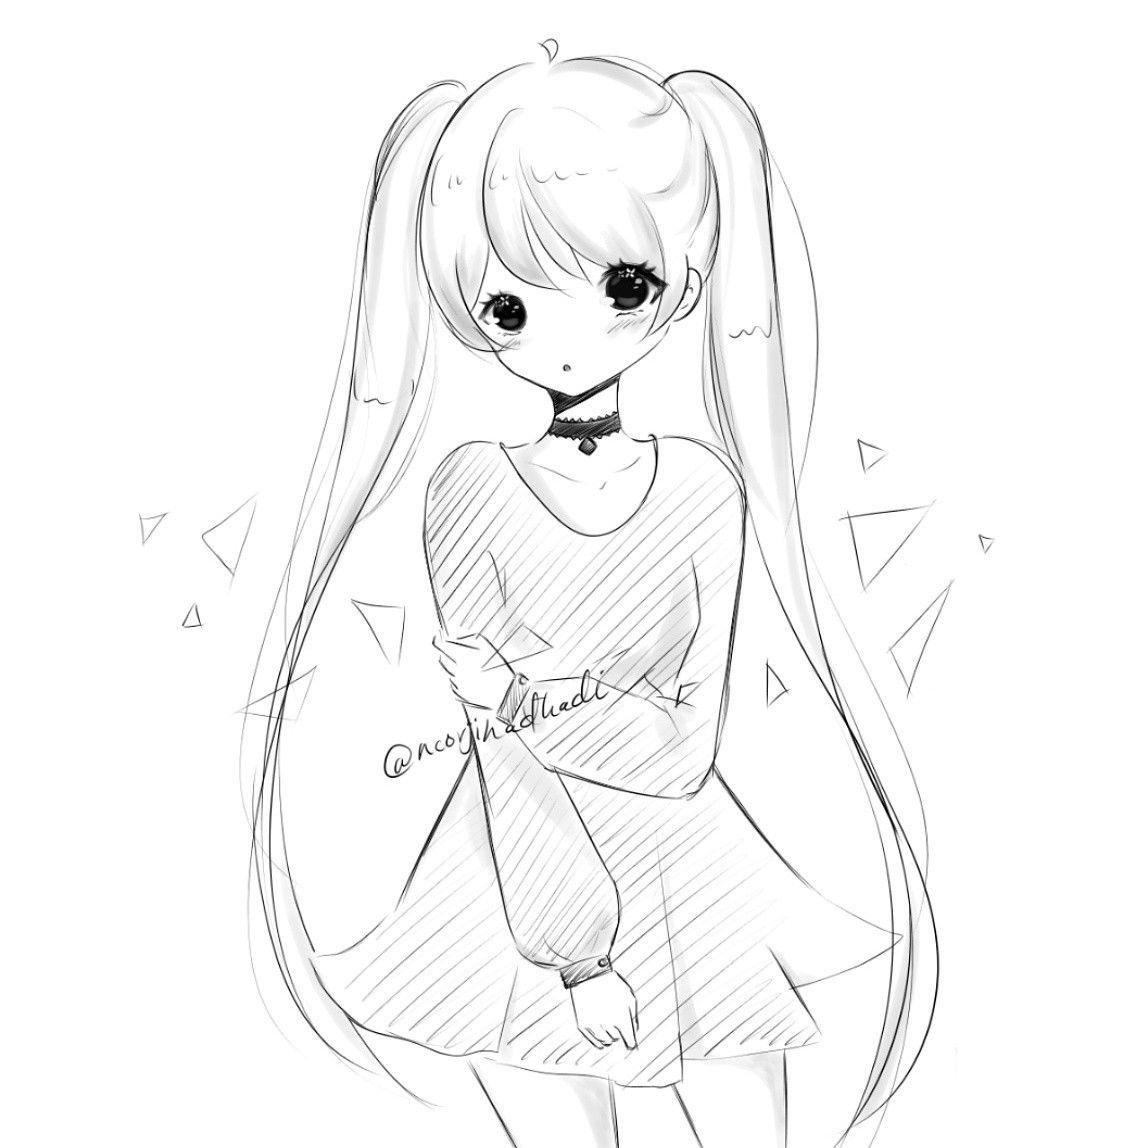 Ig Noorjihadhadi Sketch Anime Draw Drawing Animegirl Doodle Kawaii Drawings Sketches Cartoon Drawings